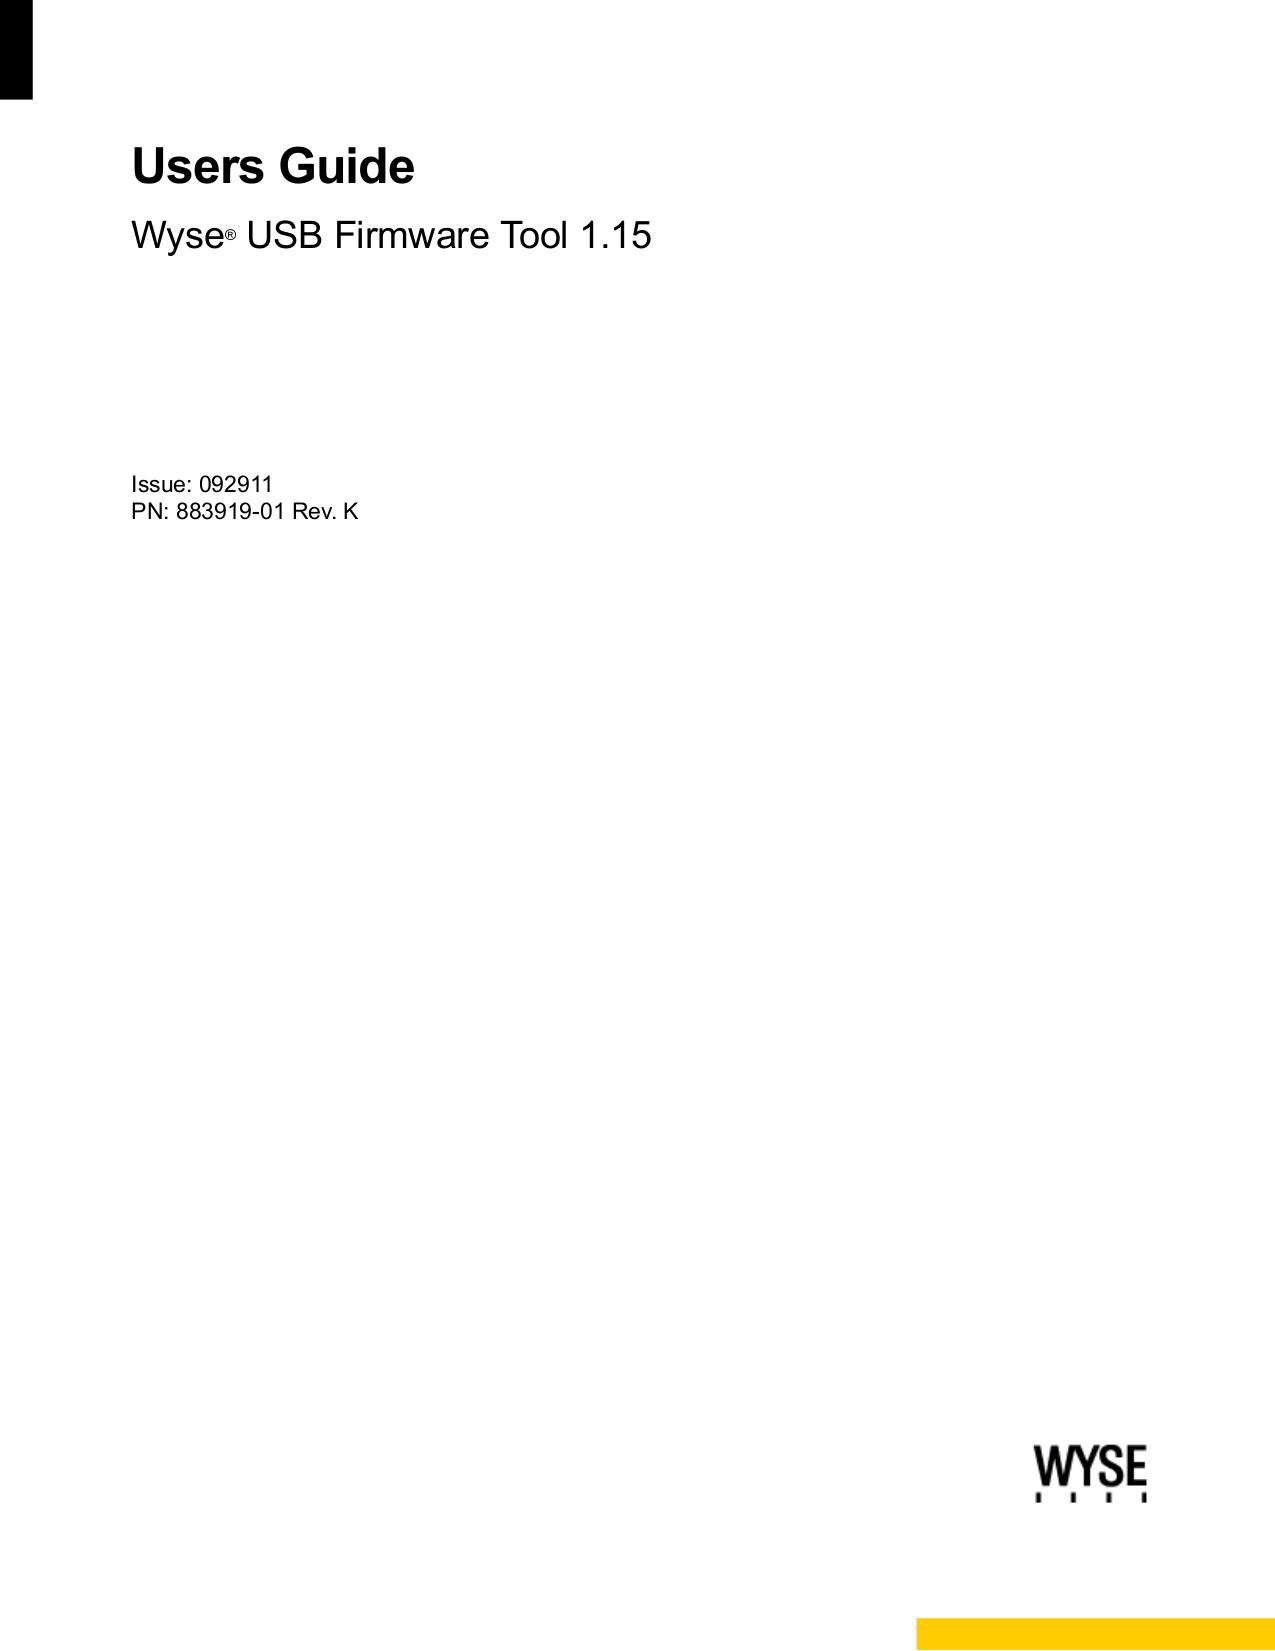 pdf for Wyse Desktop Viance manual